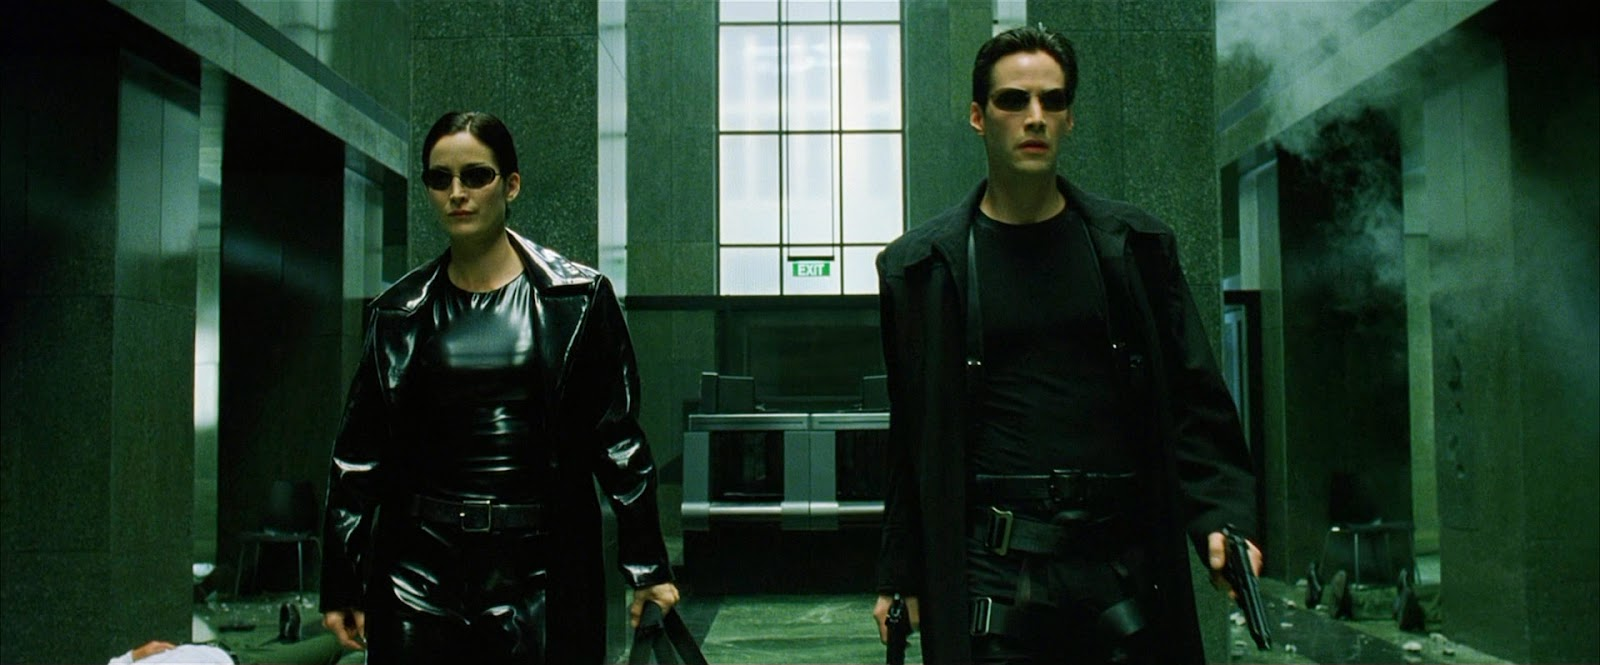 The Ace Black Movie Blog Movie Review The Matrix 1999